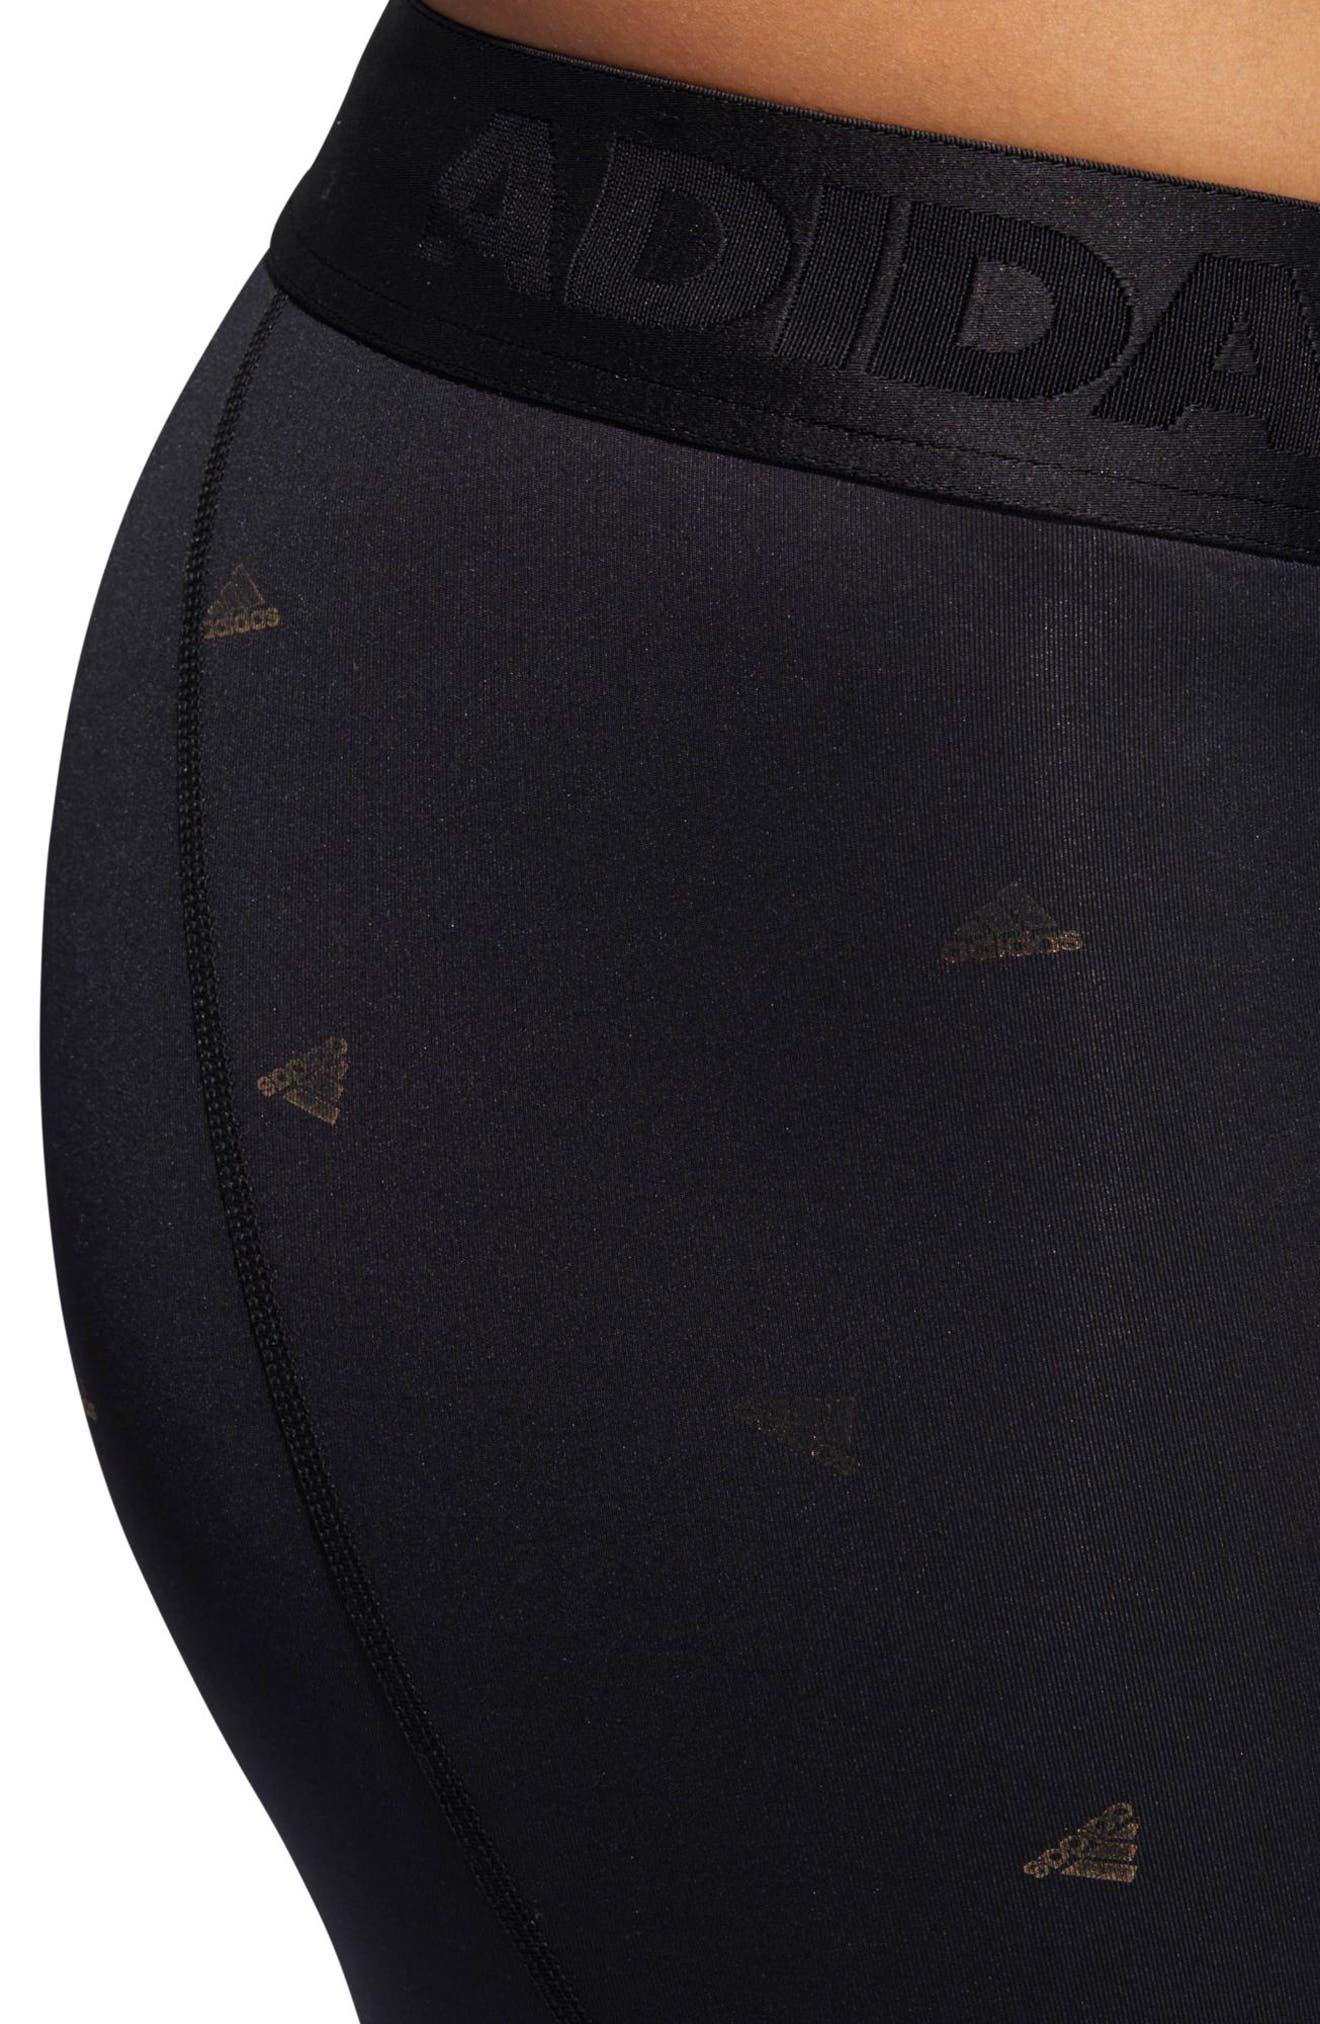 Alphaskin Sport Capri Leggings,                             Alternate thumbnail 4, color,                             Black / Print